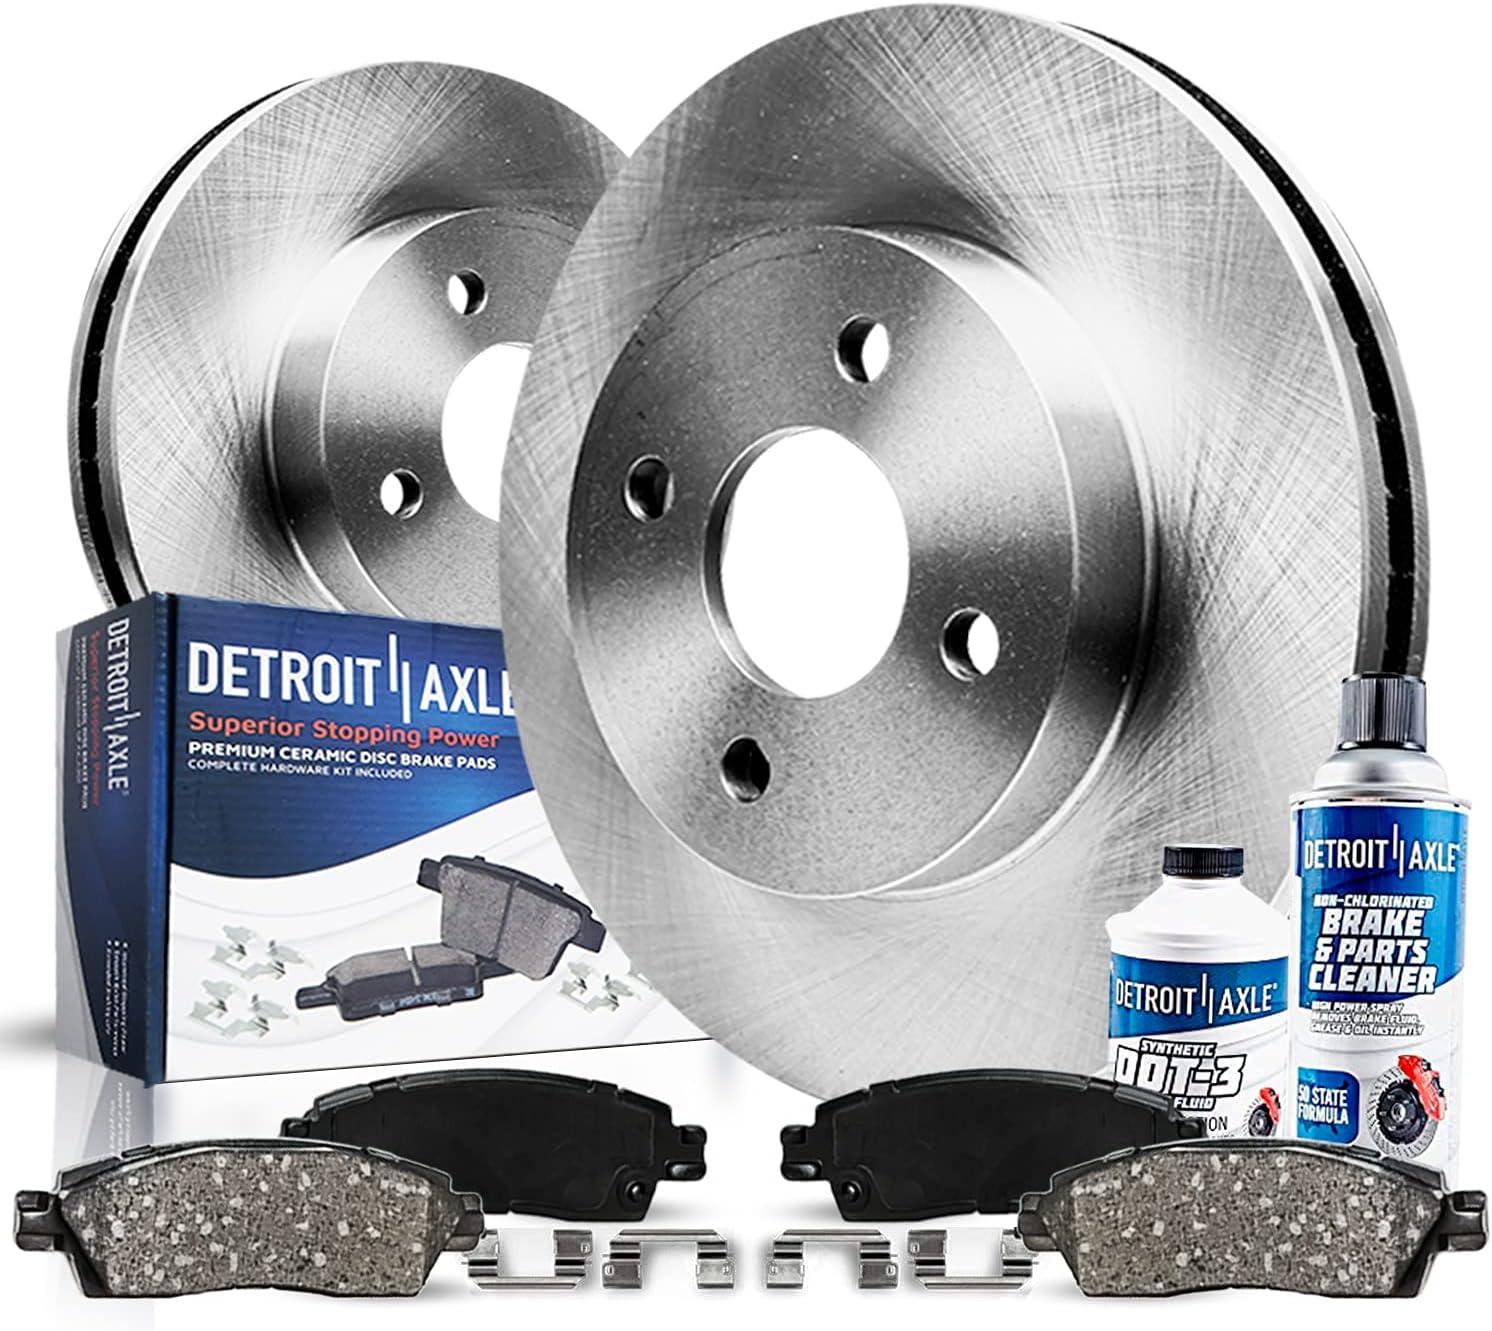 Front Disc Brake Kit Rotors 受注生産品 F Pads Cleaner クリアランスsale!期間限定! w Ceramic